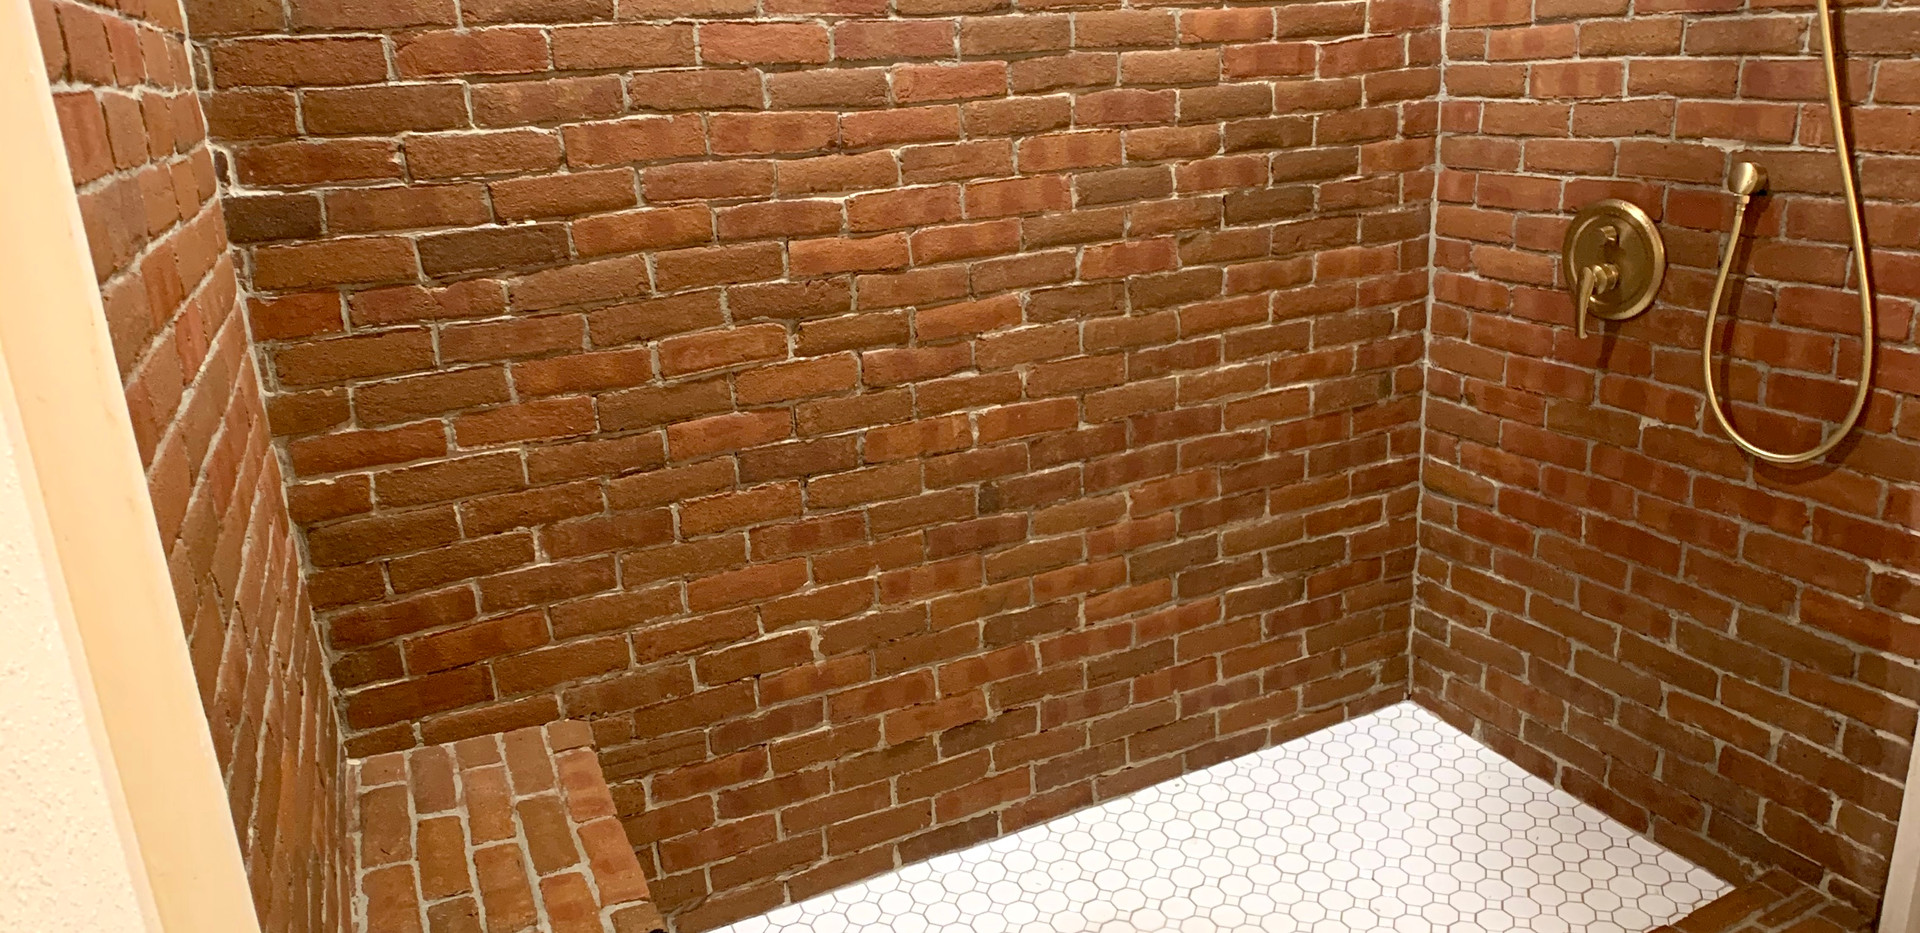 Floor to ceiling brick shower